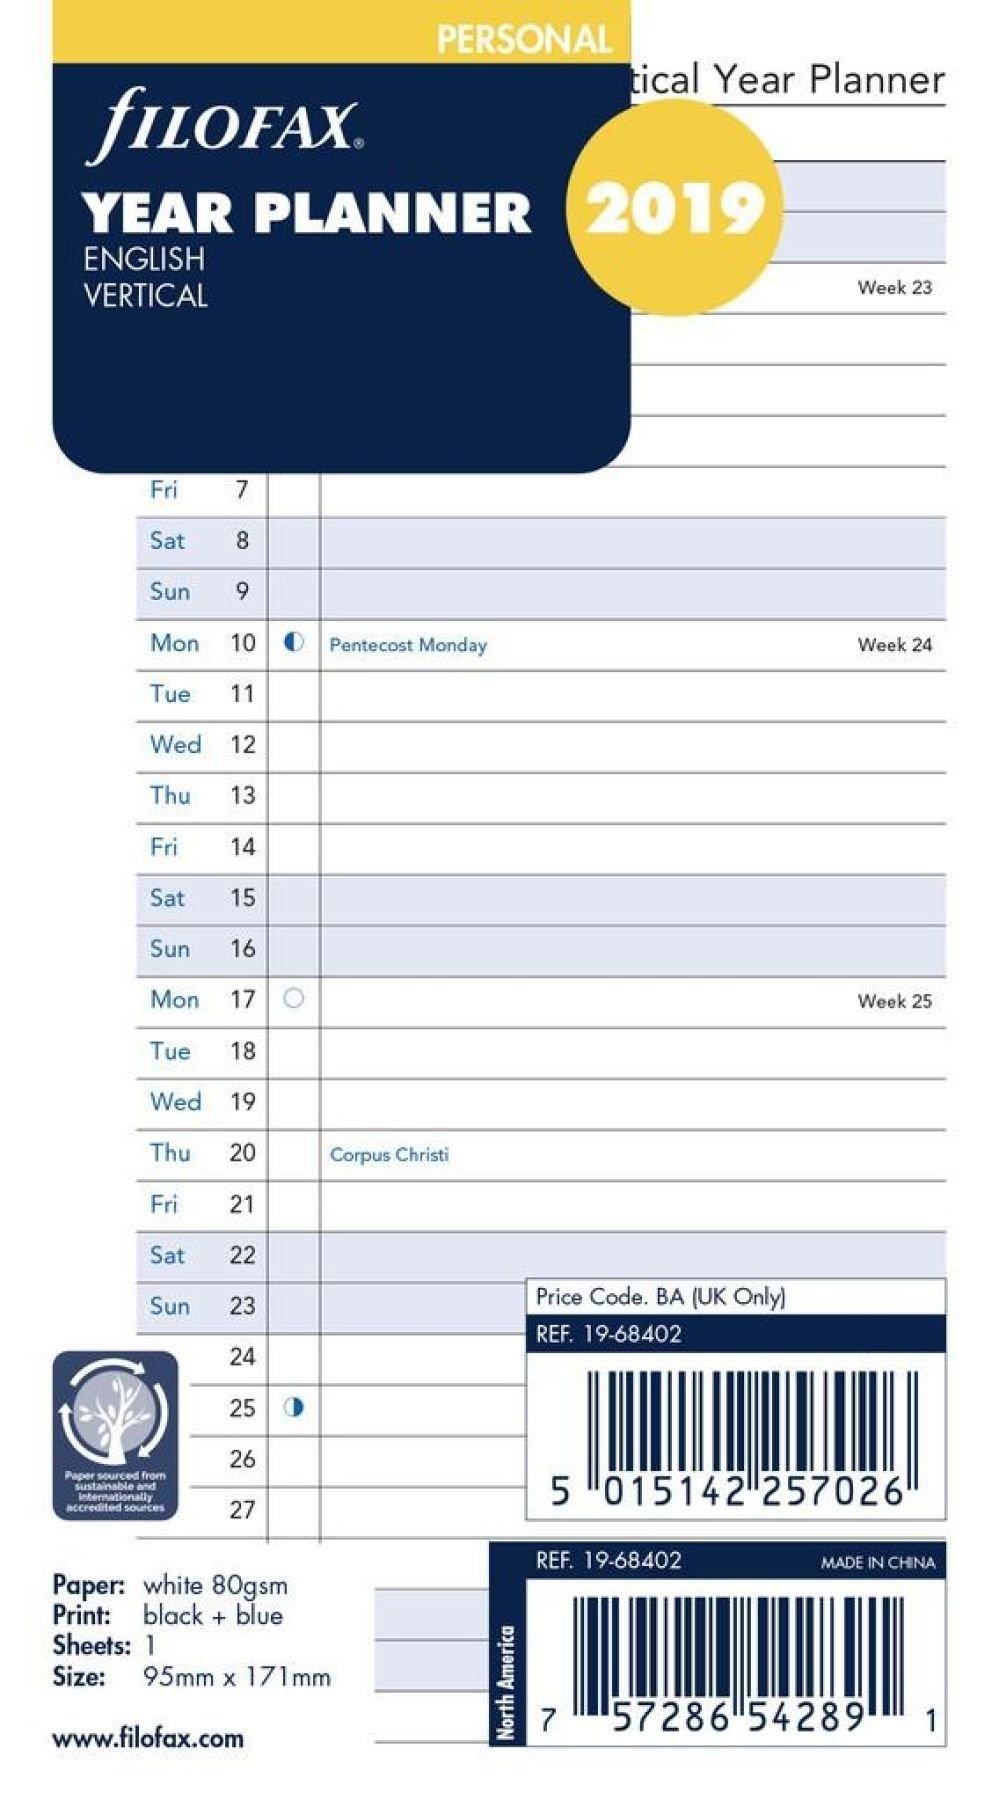 Filofax 2019 - Full Year Vertical Planner Calendar Refill - Personal Calendar 2019 Refill